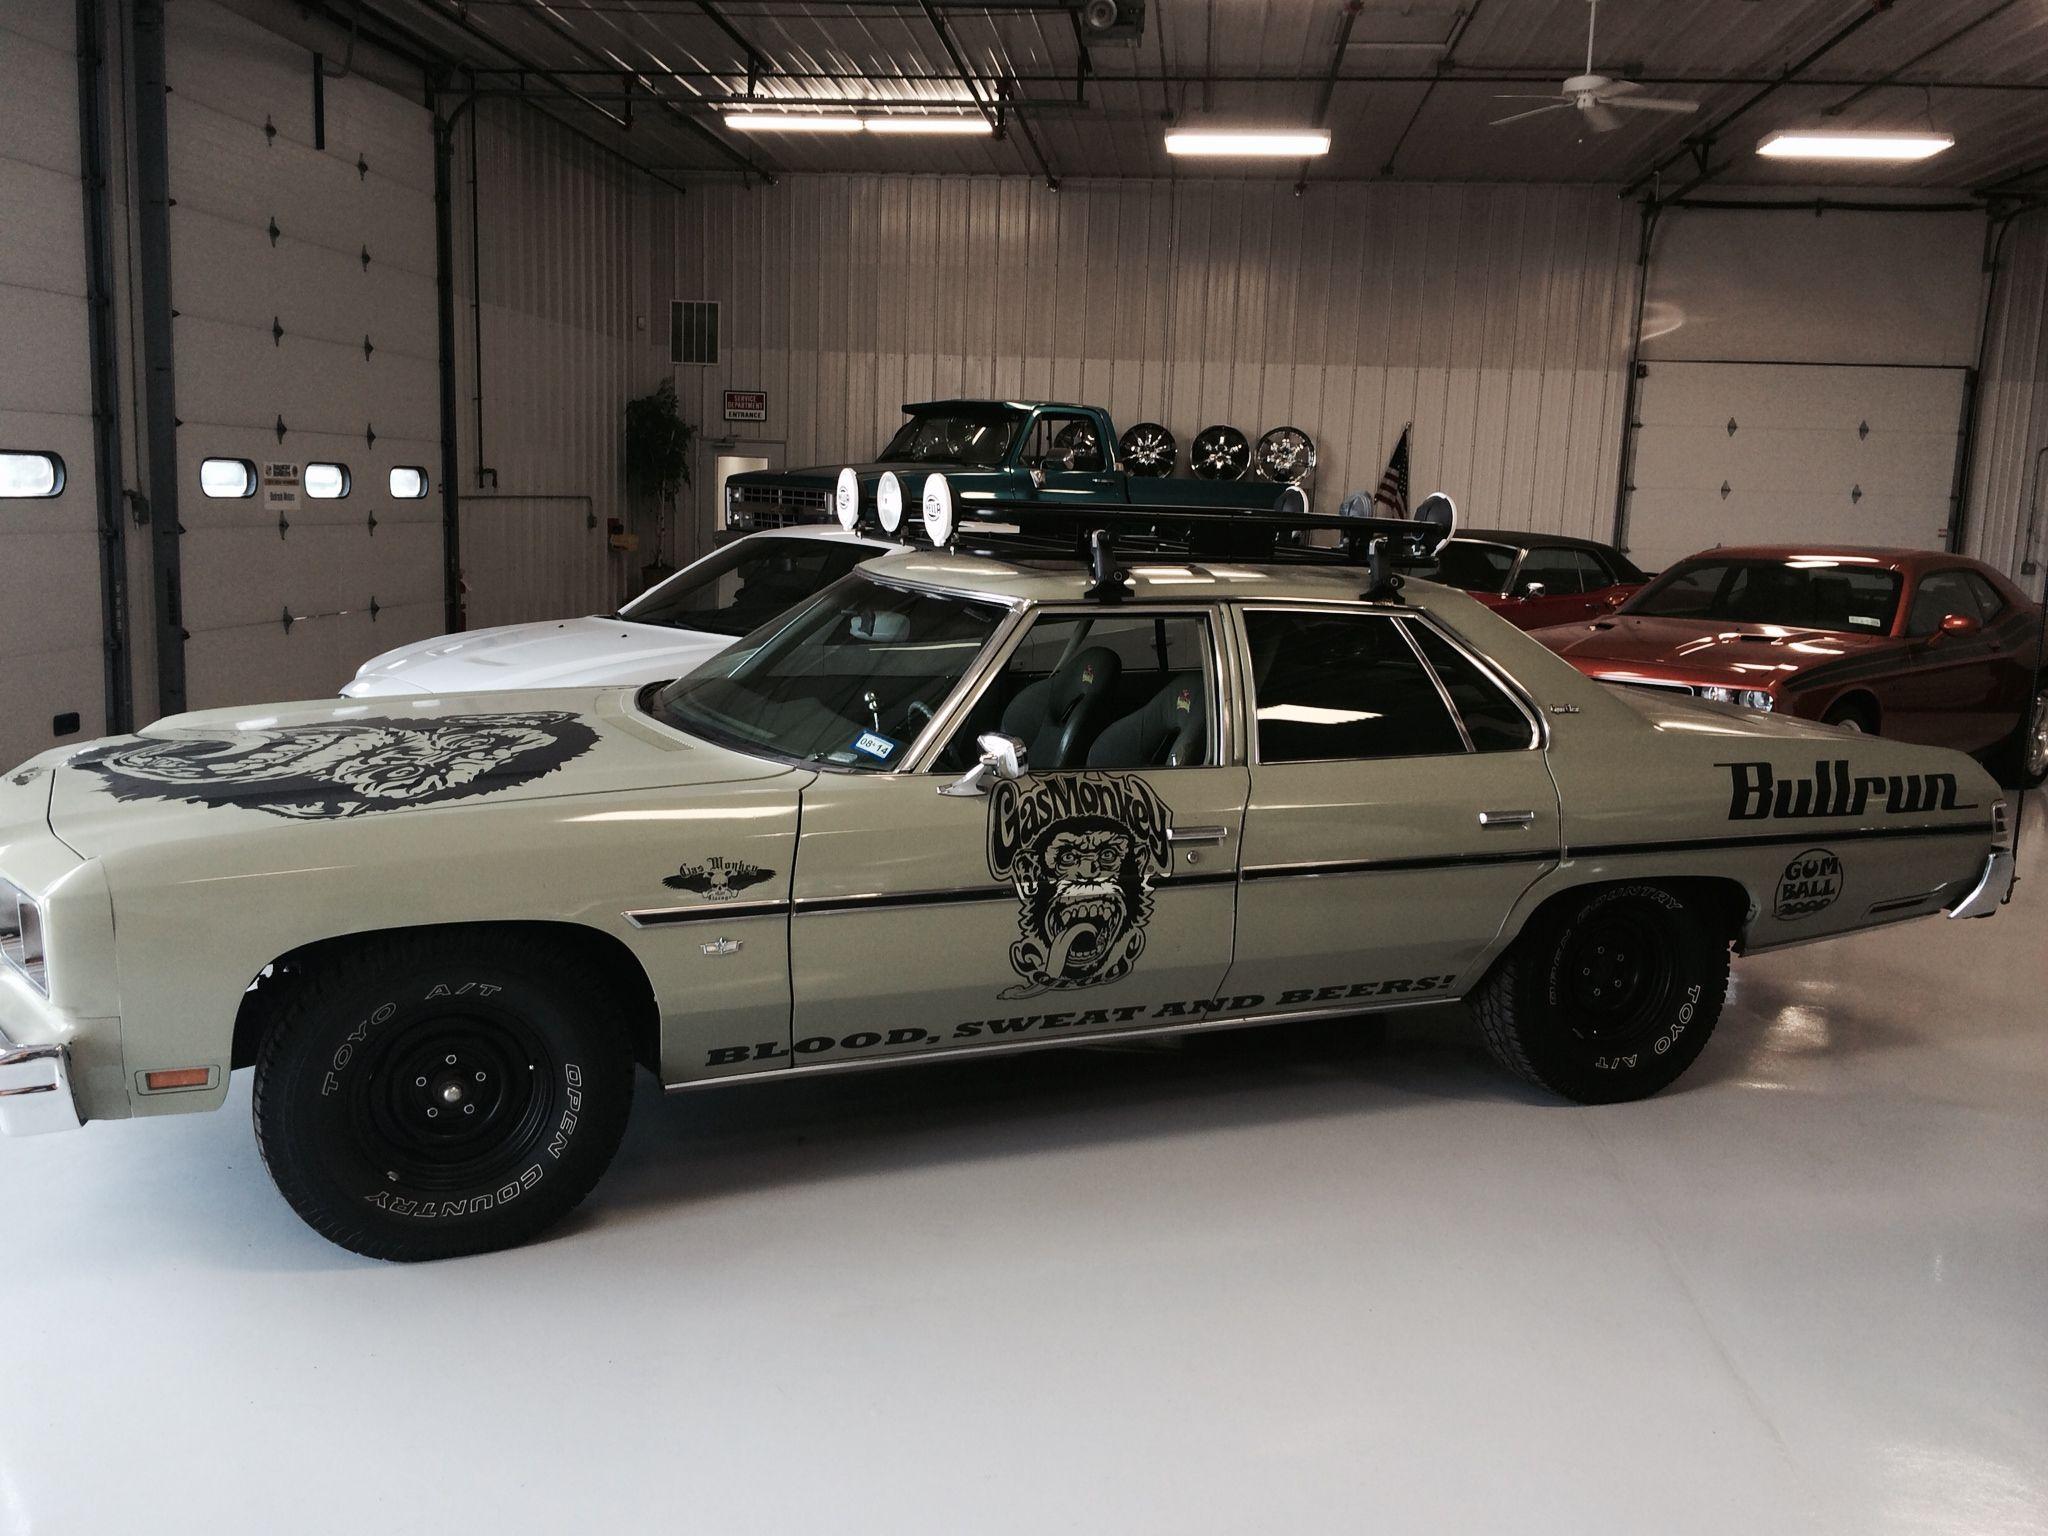 Gas Monkey Garage S Custom Caprice On The Showfloor Very Cool Car